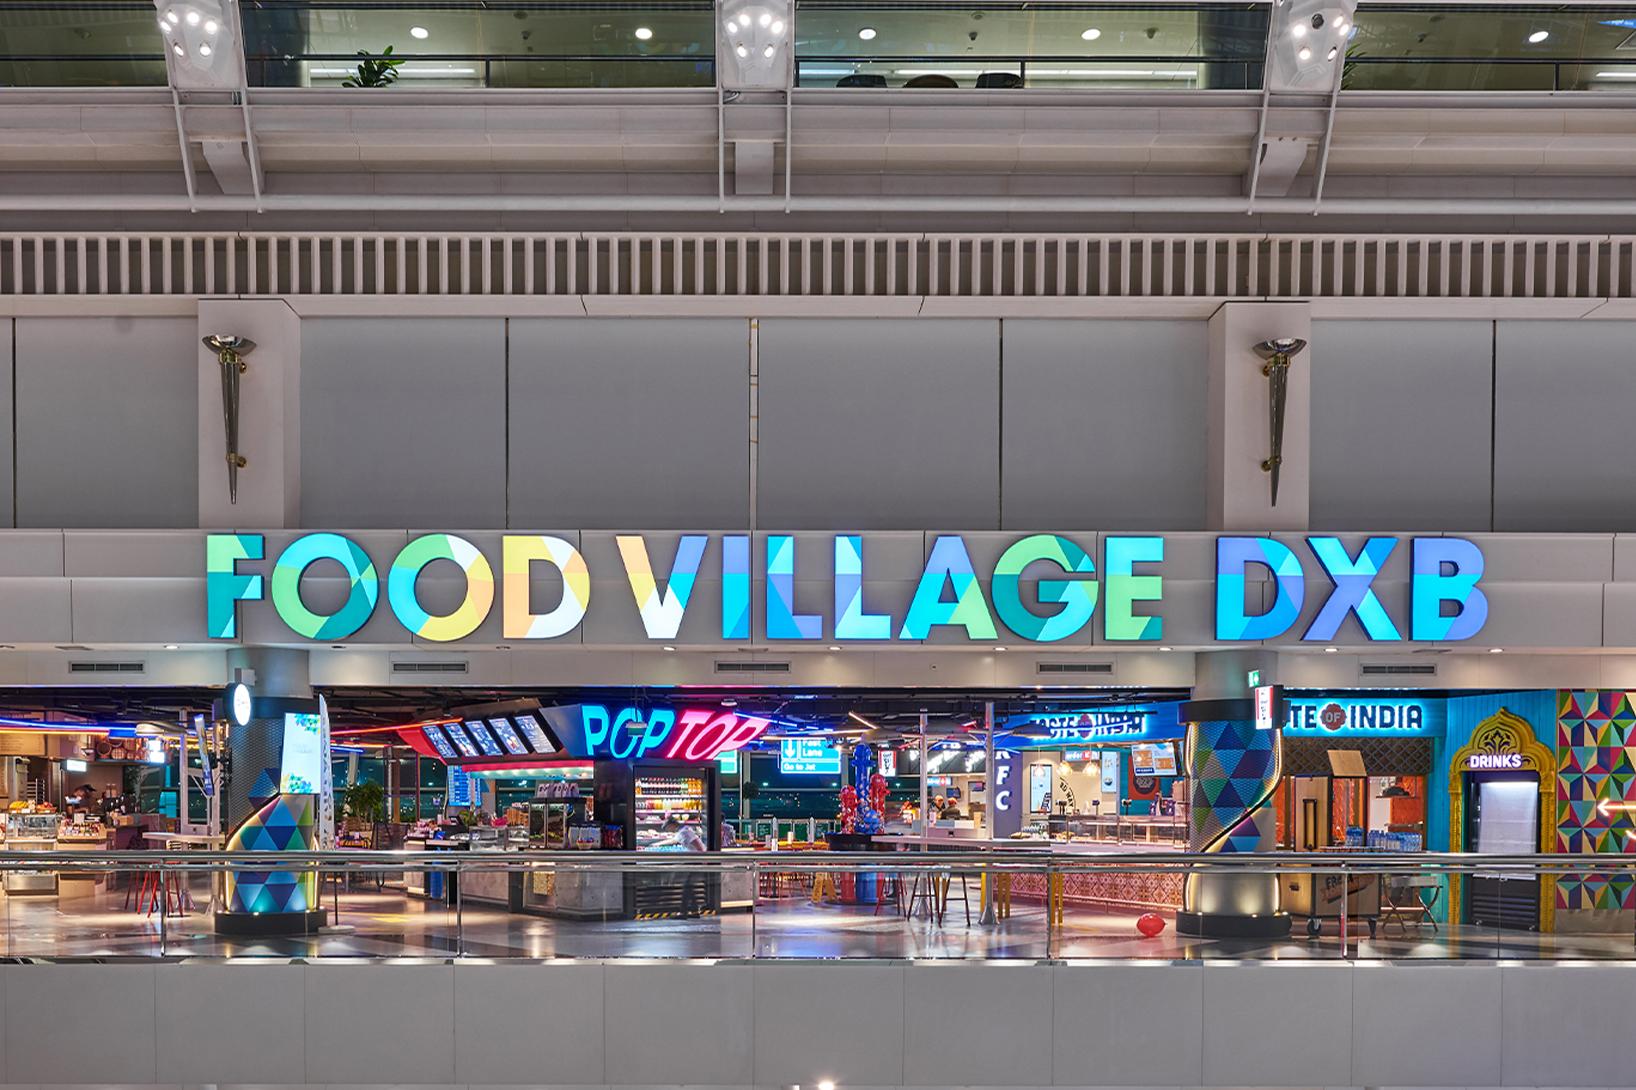 Food Village DXB